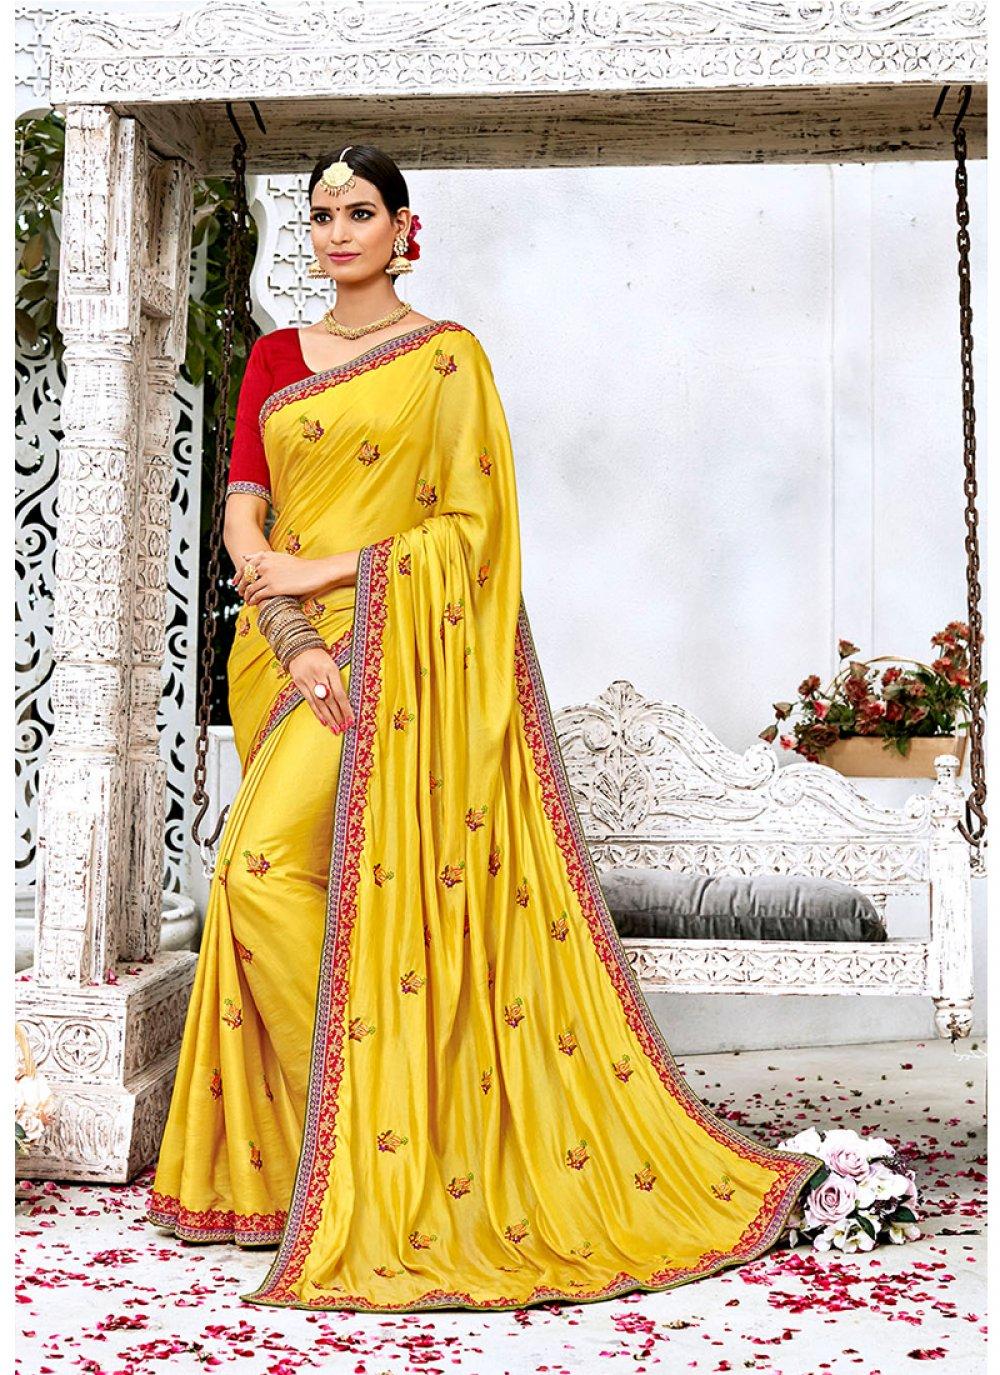 Lace Work Contemporary Saree